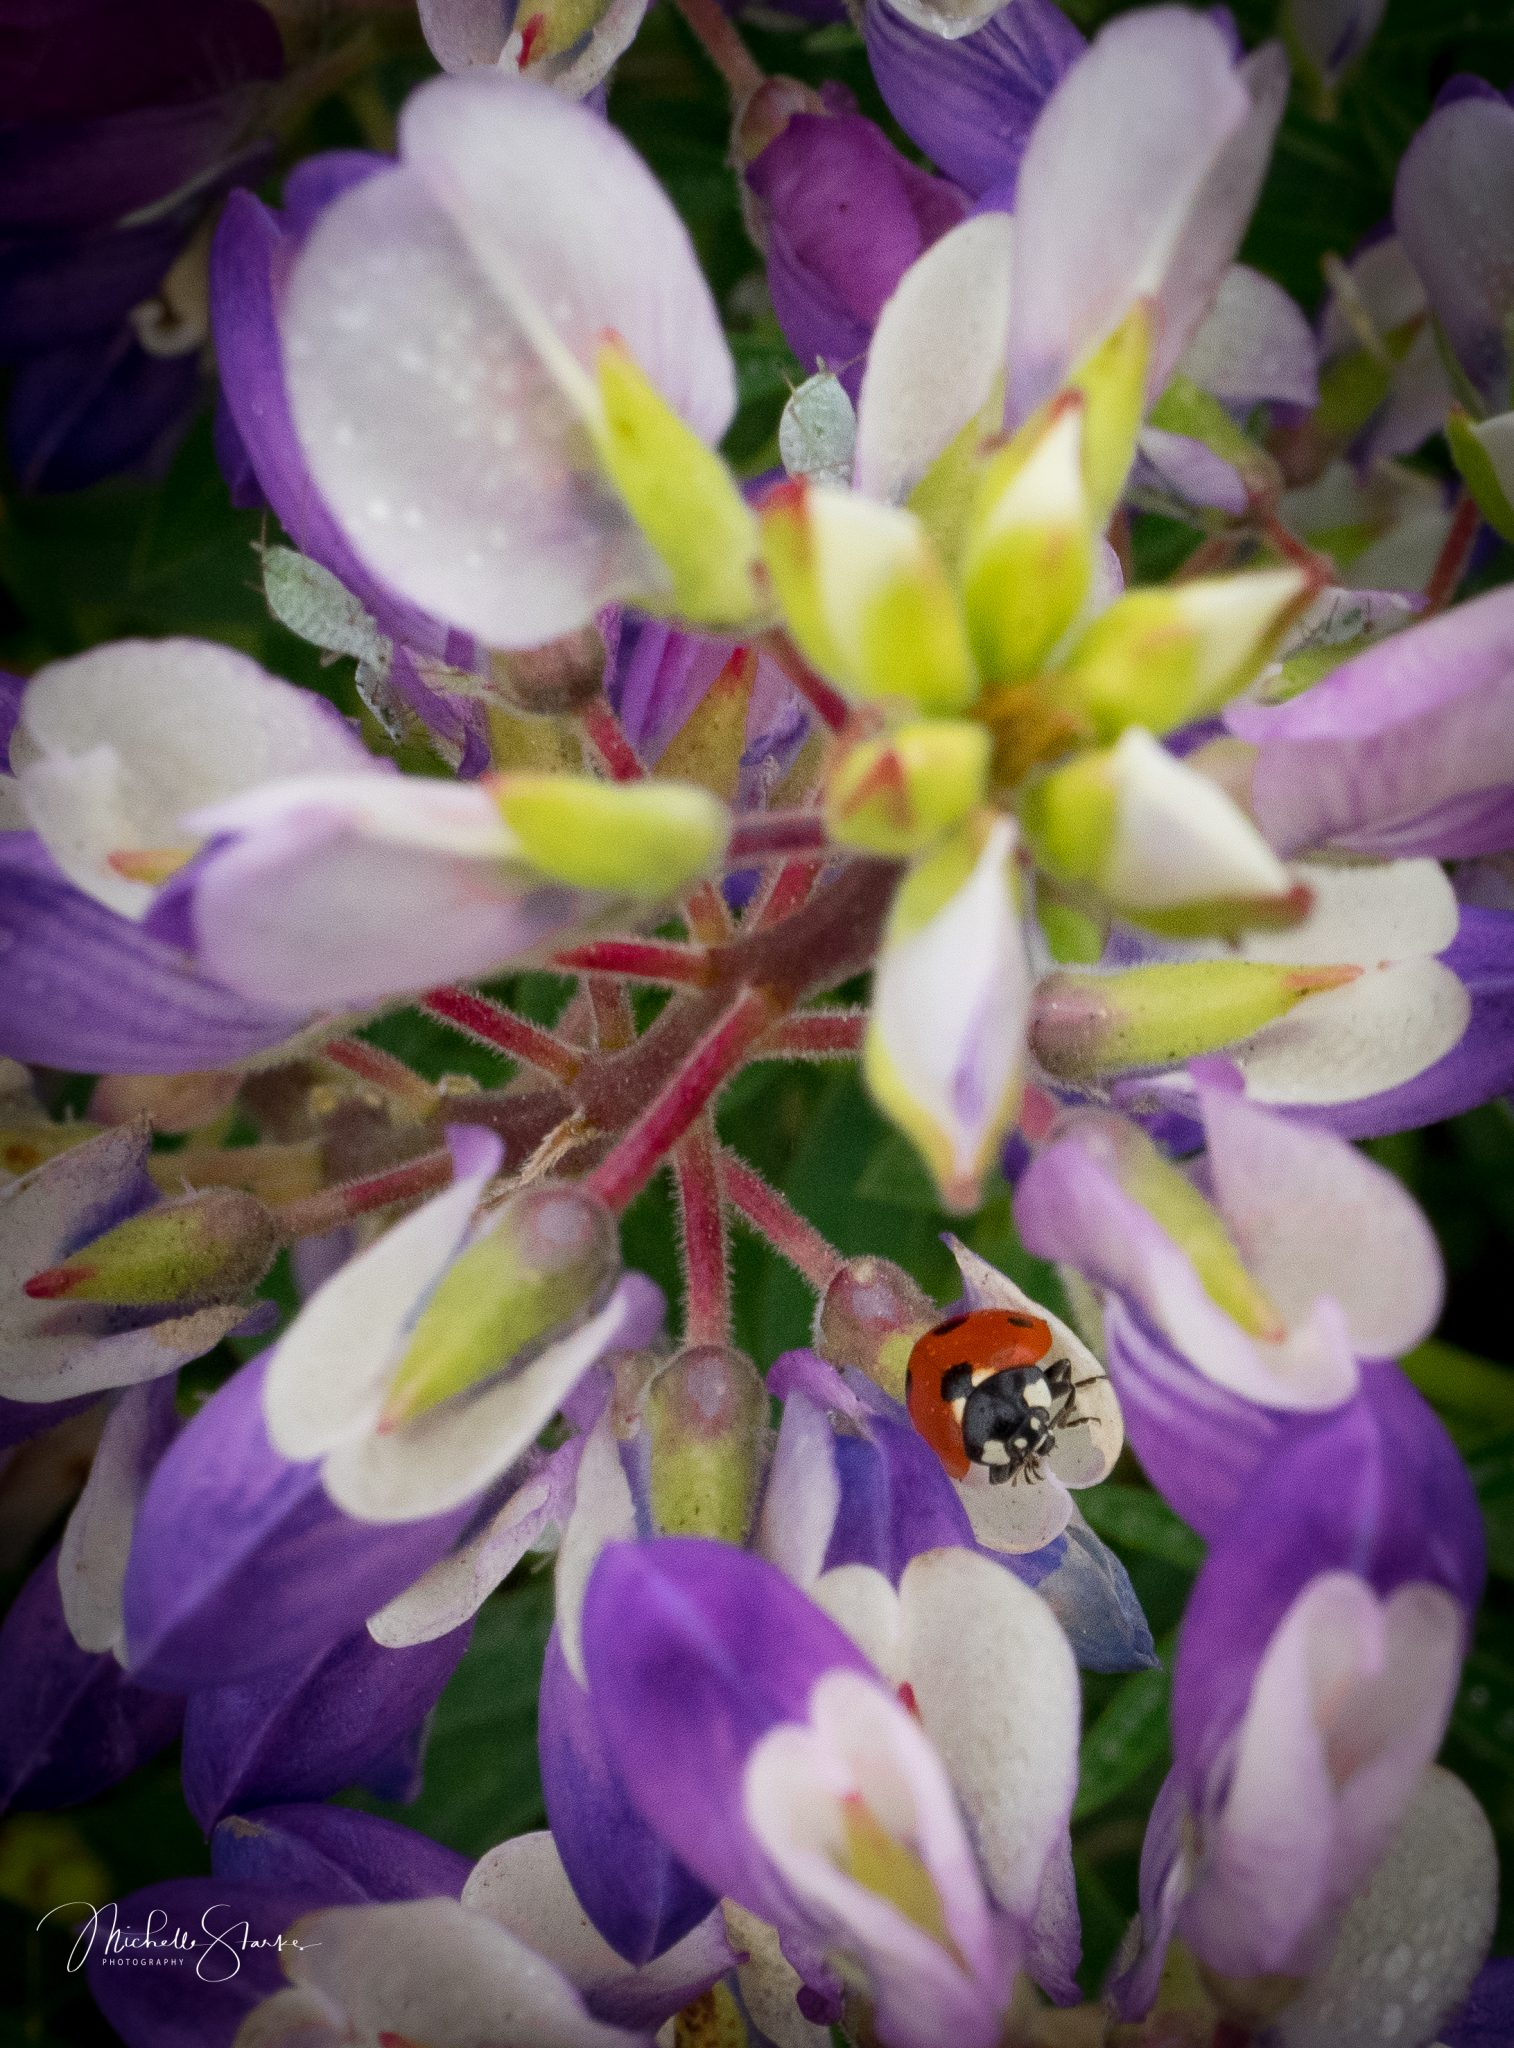 Ladybug in Lupin, Oregon